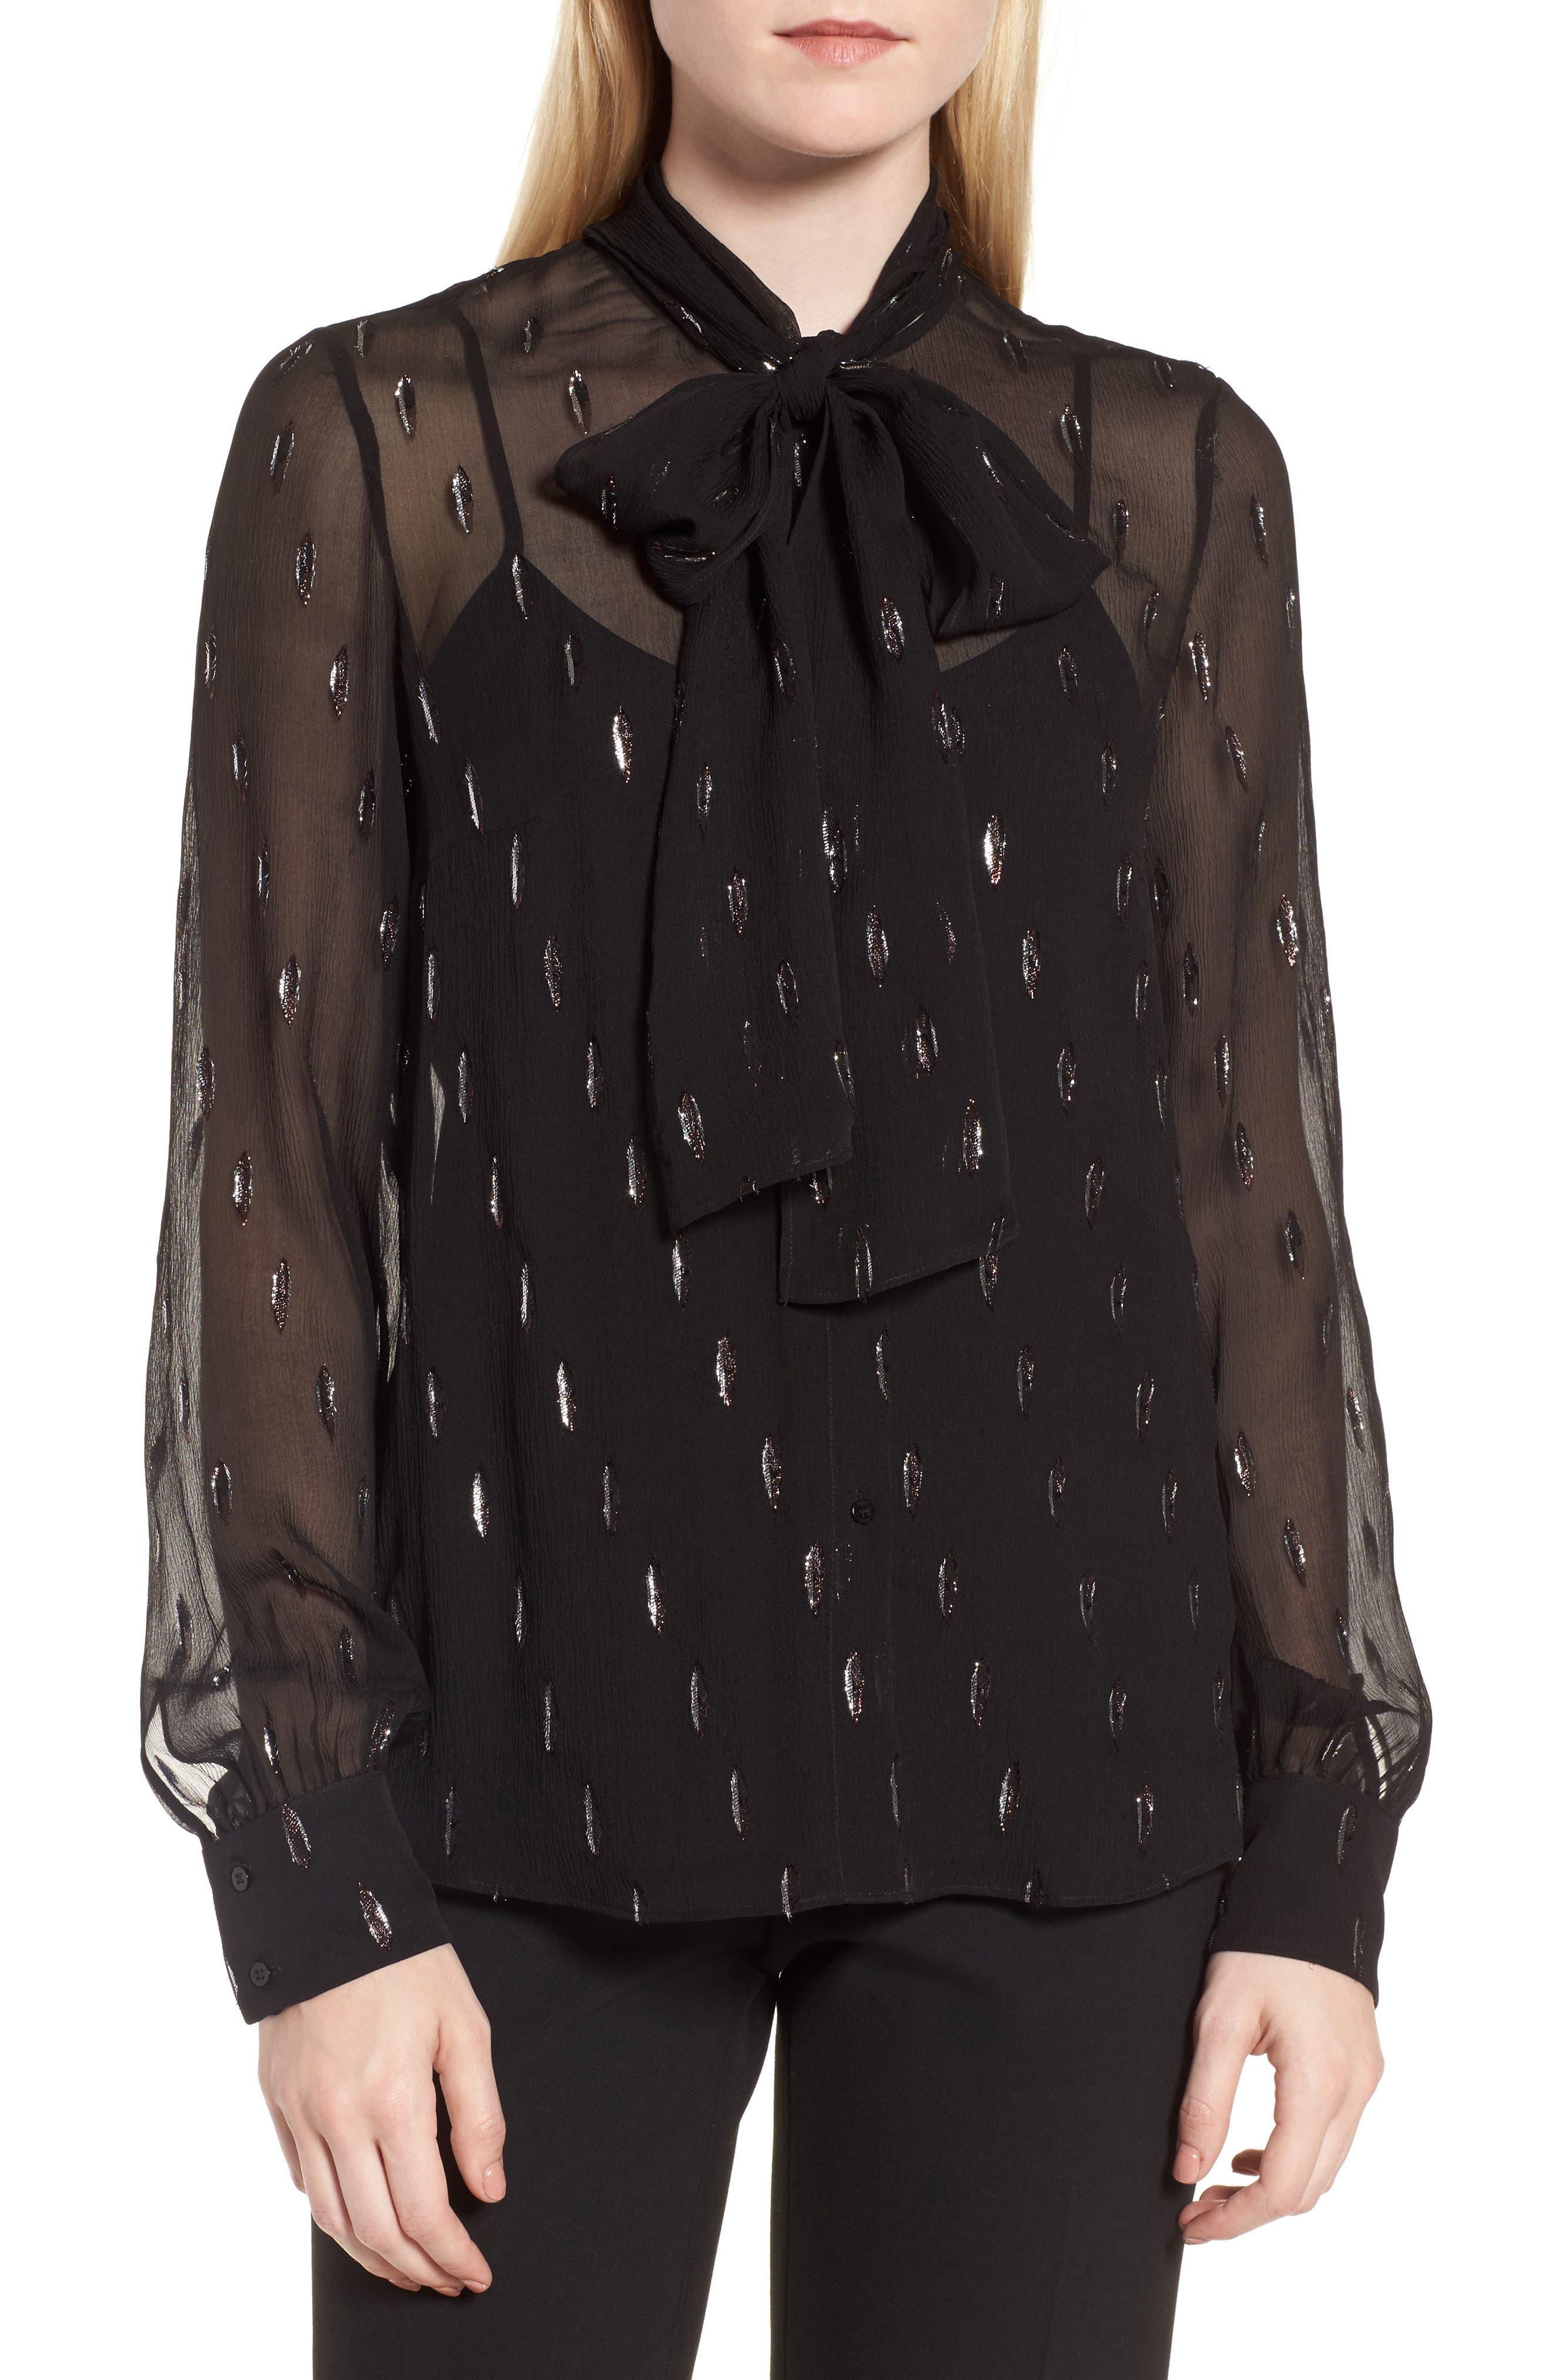 Bavimea Tie Neck Metallic Detail Blouse,                         Main,                         color, Black Fantasy